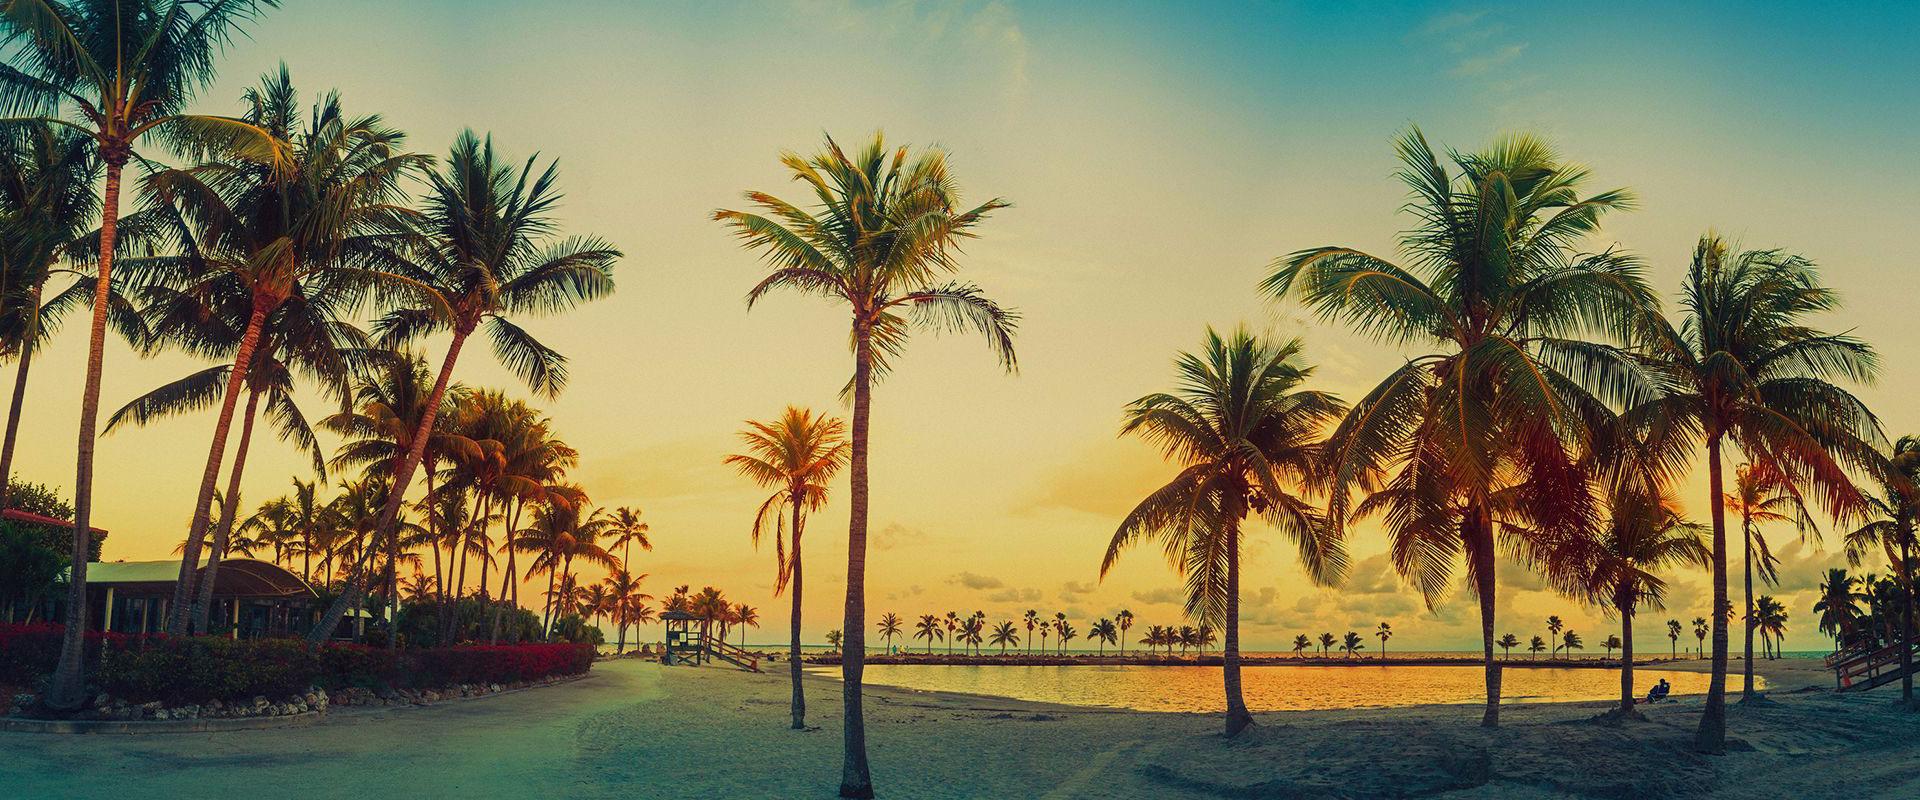 Miami-amerika-yurtdisi-egitim-7.jpg